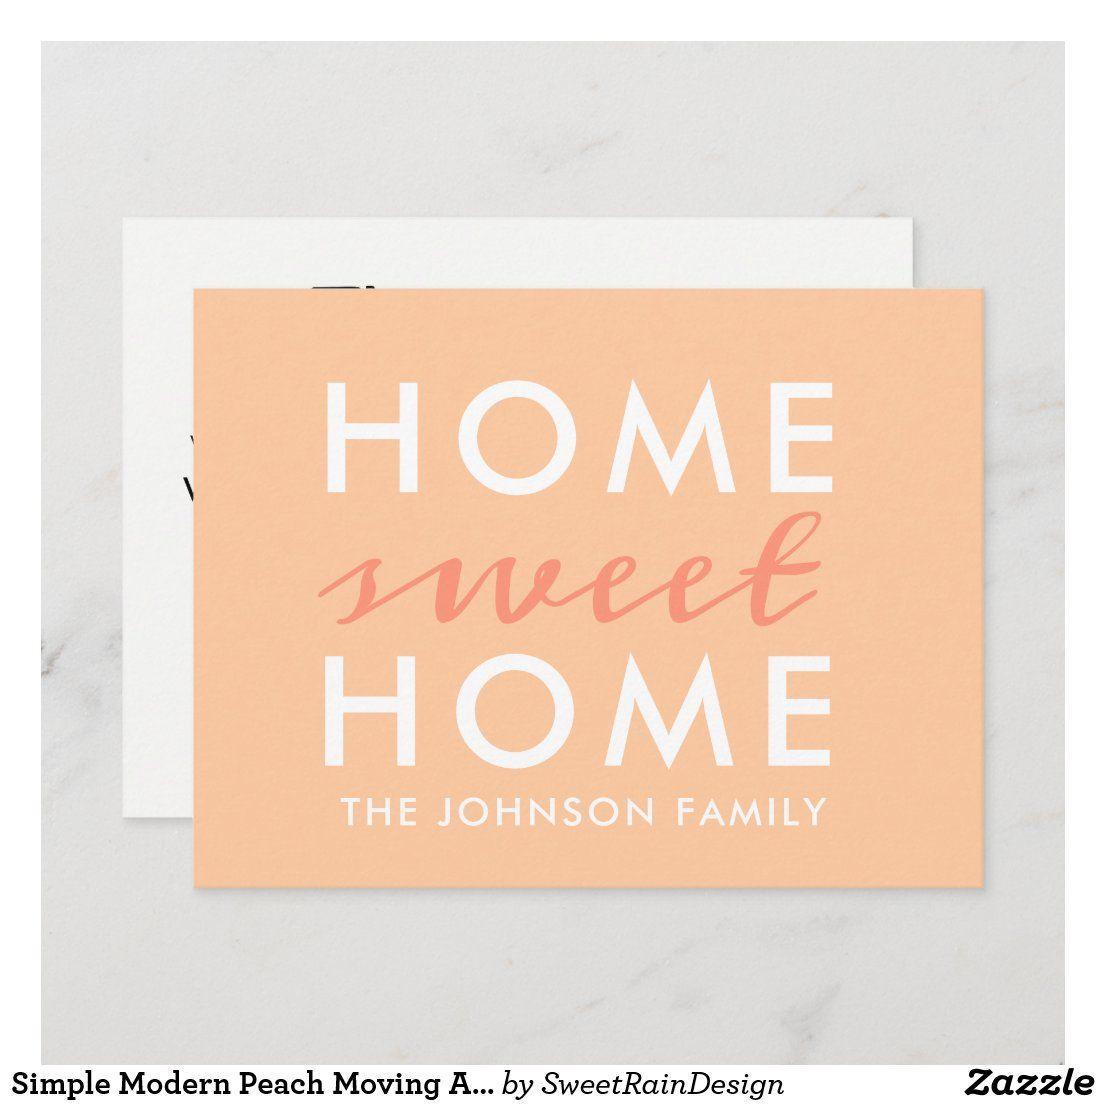 Simple Modern Peach Moving Announcement Postcard Zazzle